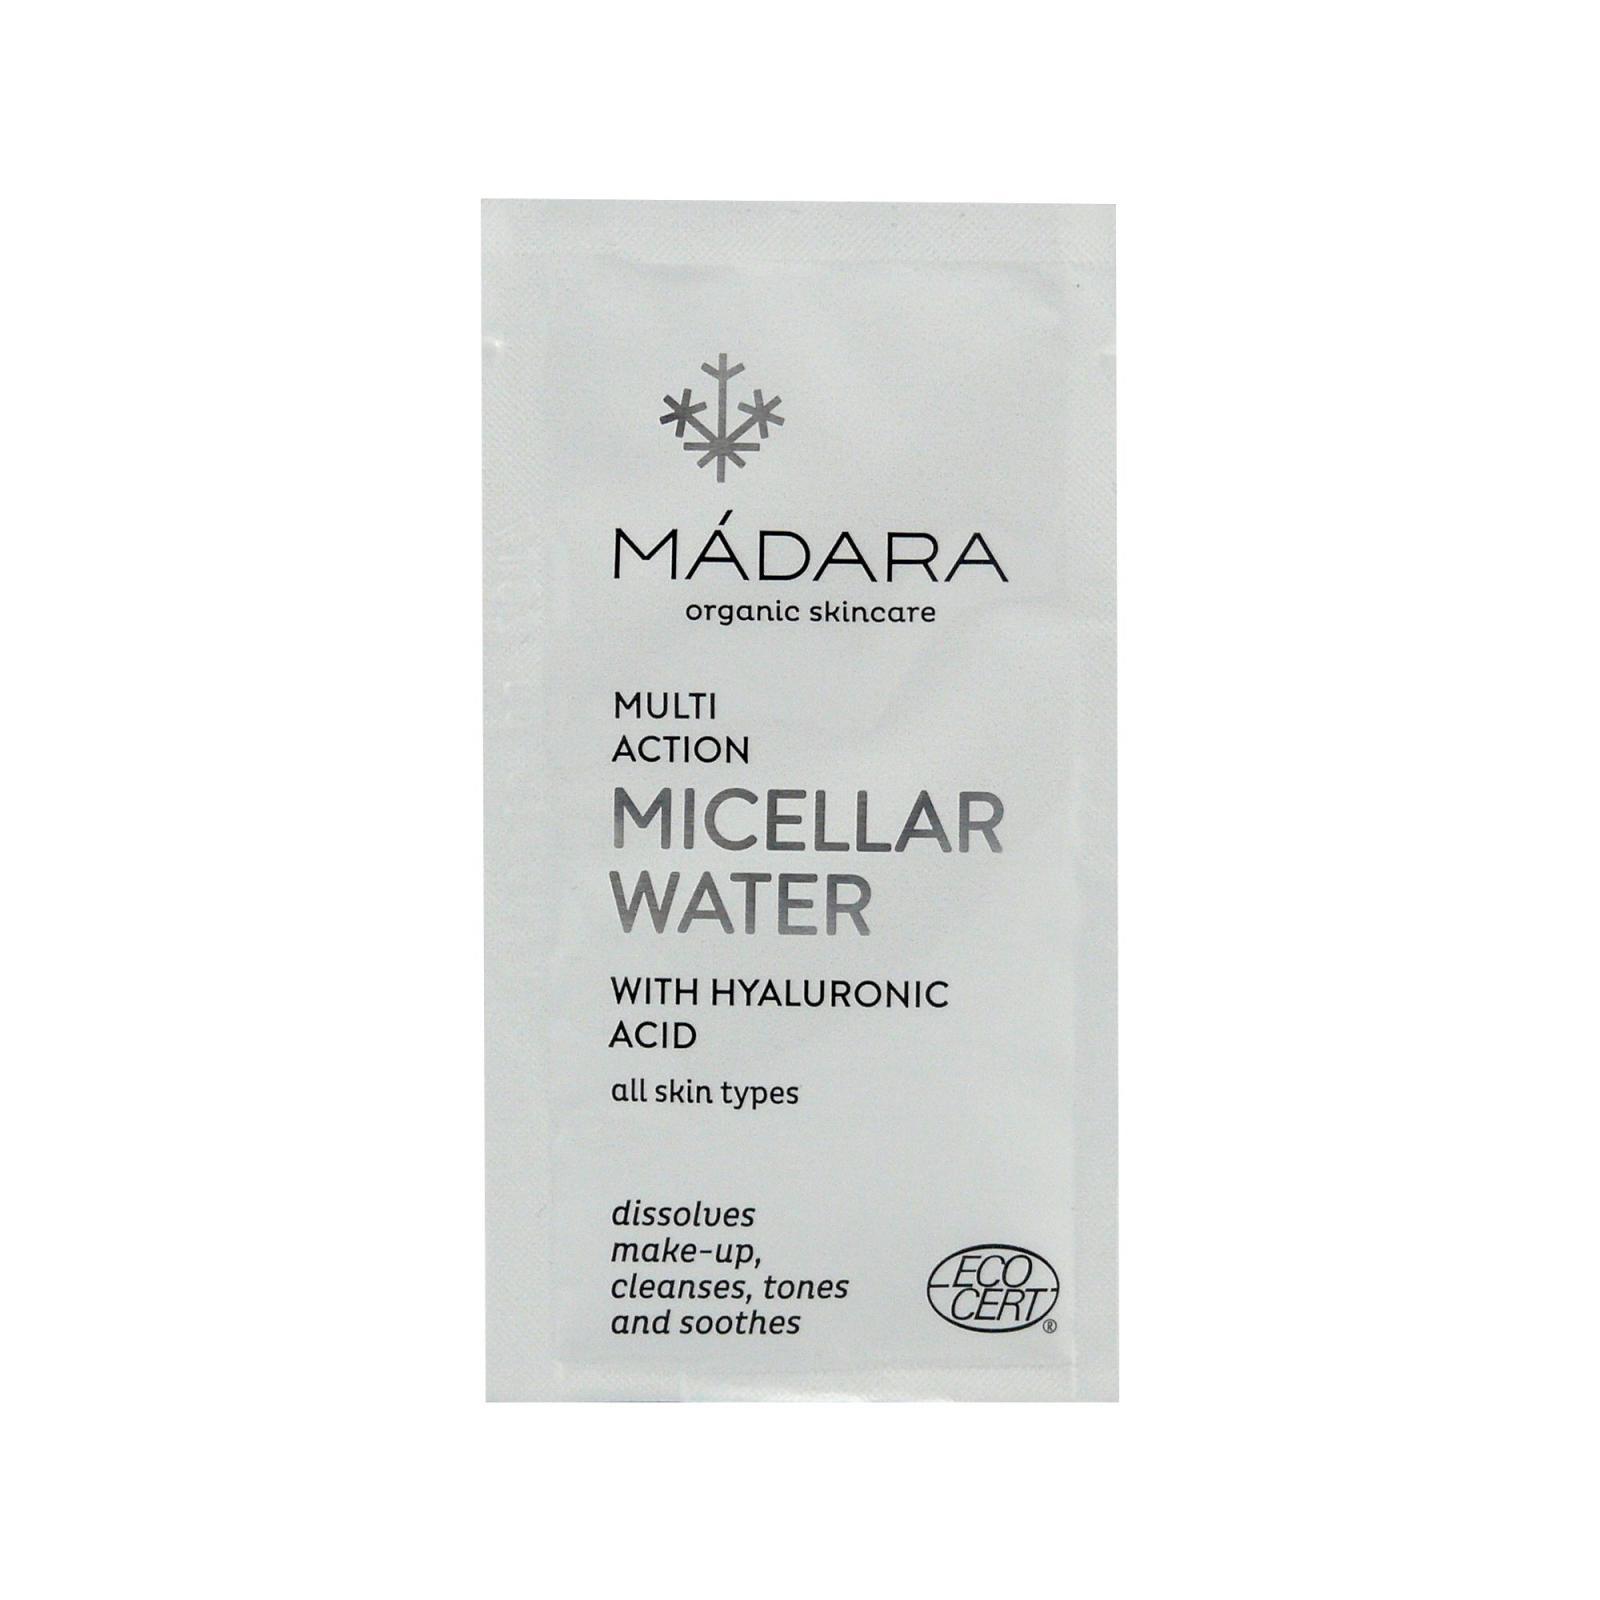 Mádara Micelární voda 5 ml